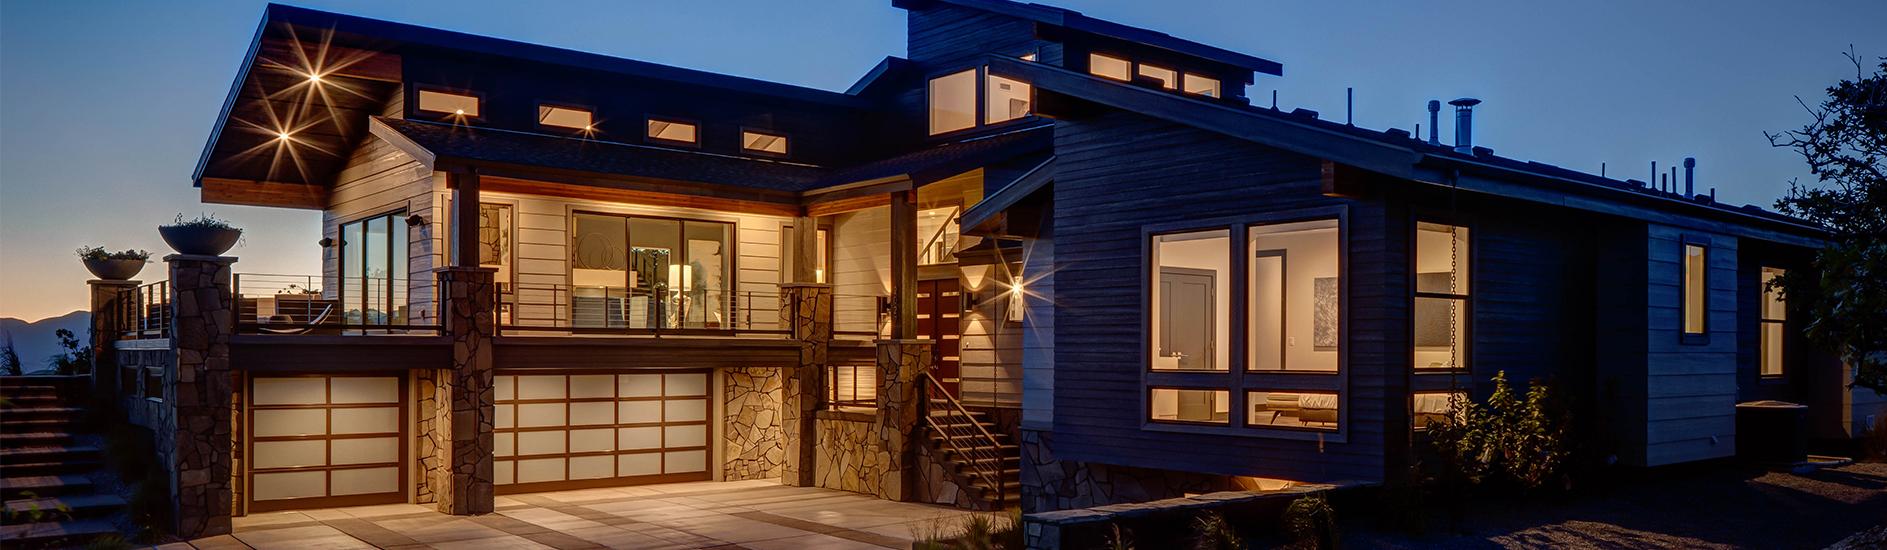 Black Aluminum Garage Doors Innovative Home Design